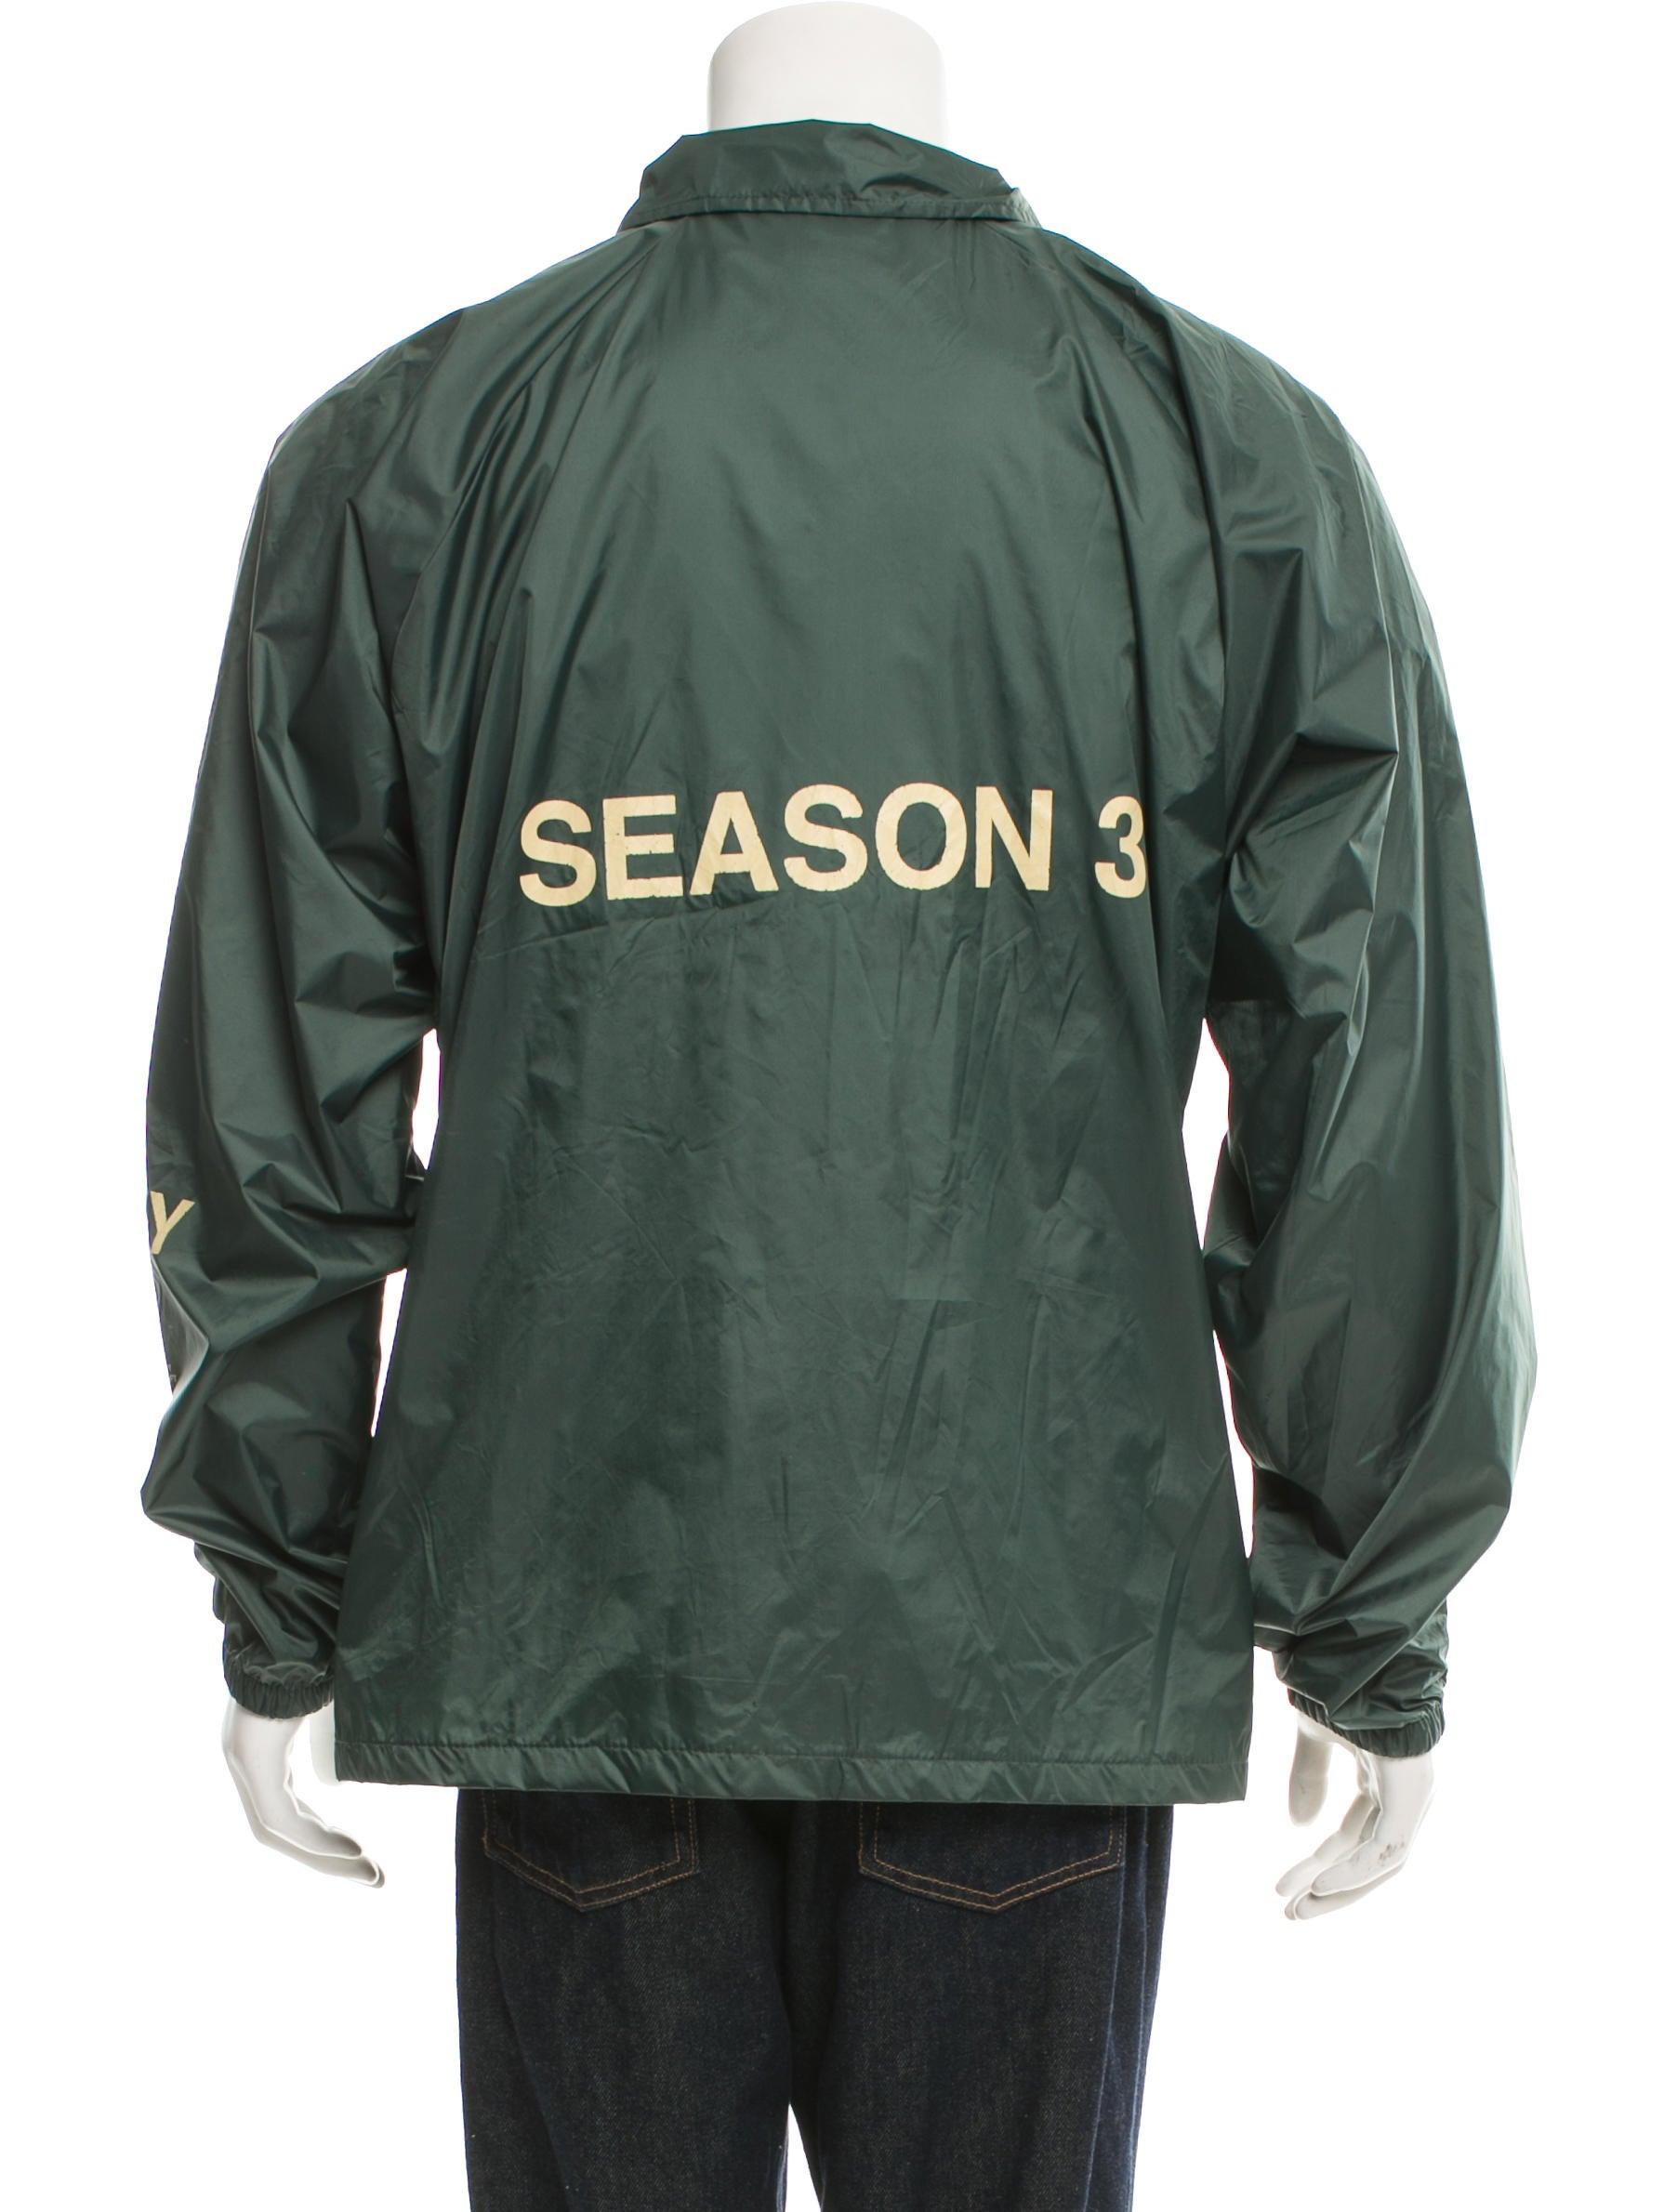 yeezy season 3 invitation coaches jacket clothing. Black Bedroom Furniture Sets. Home Design Ideas